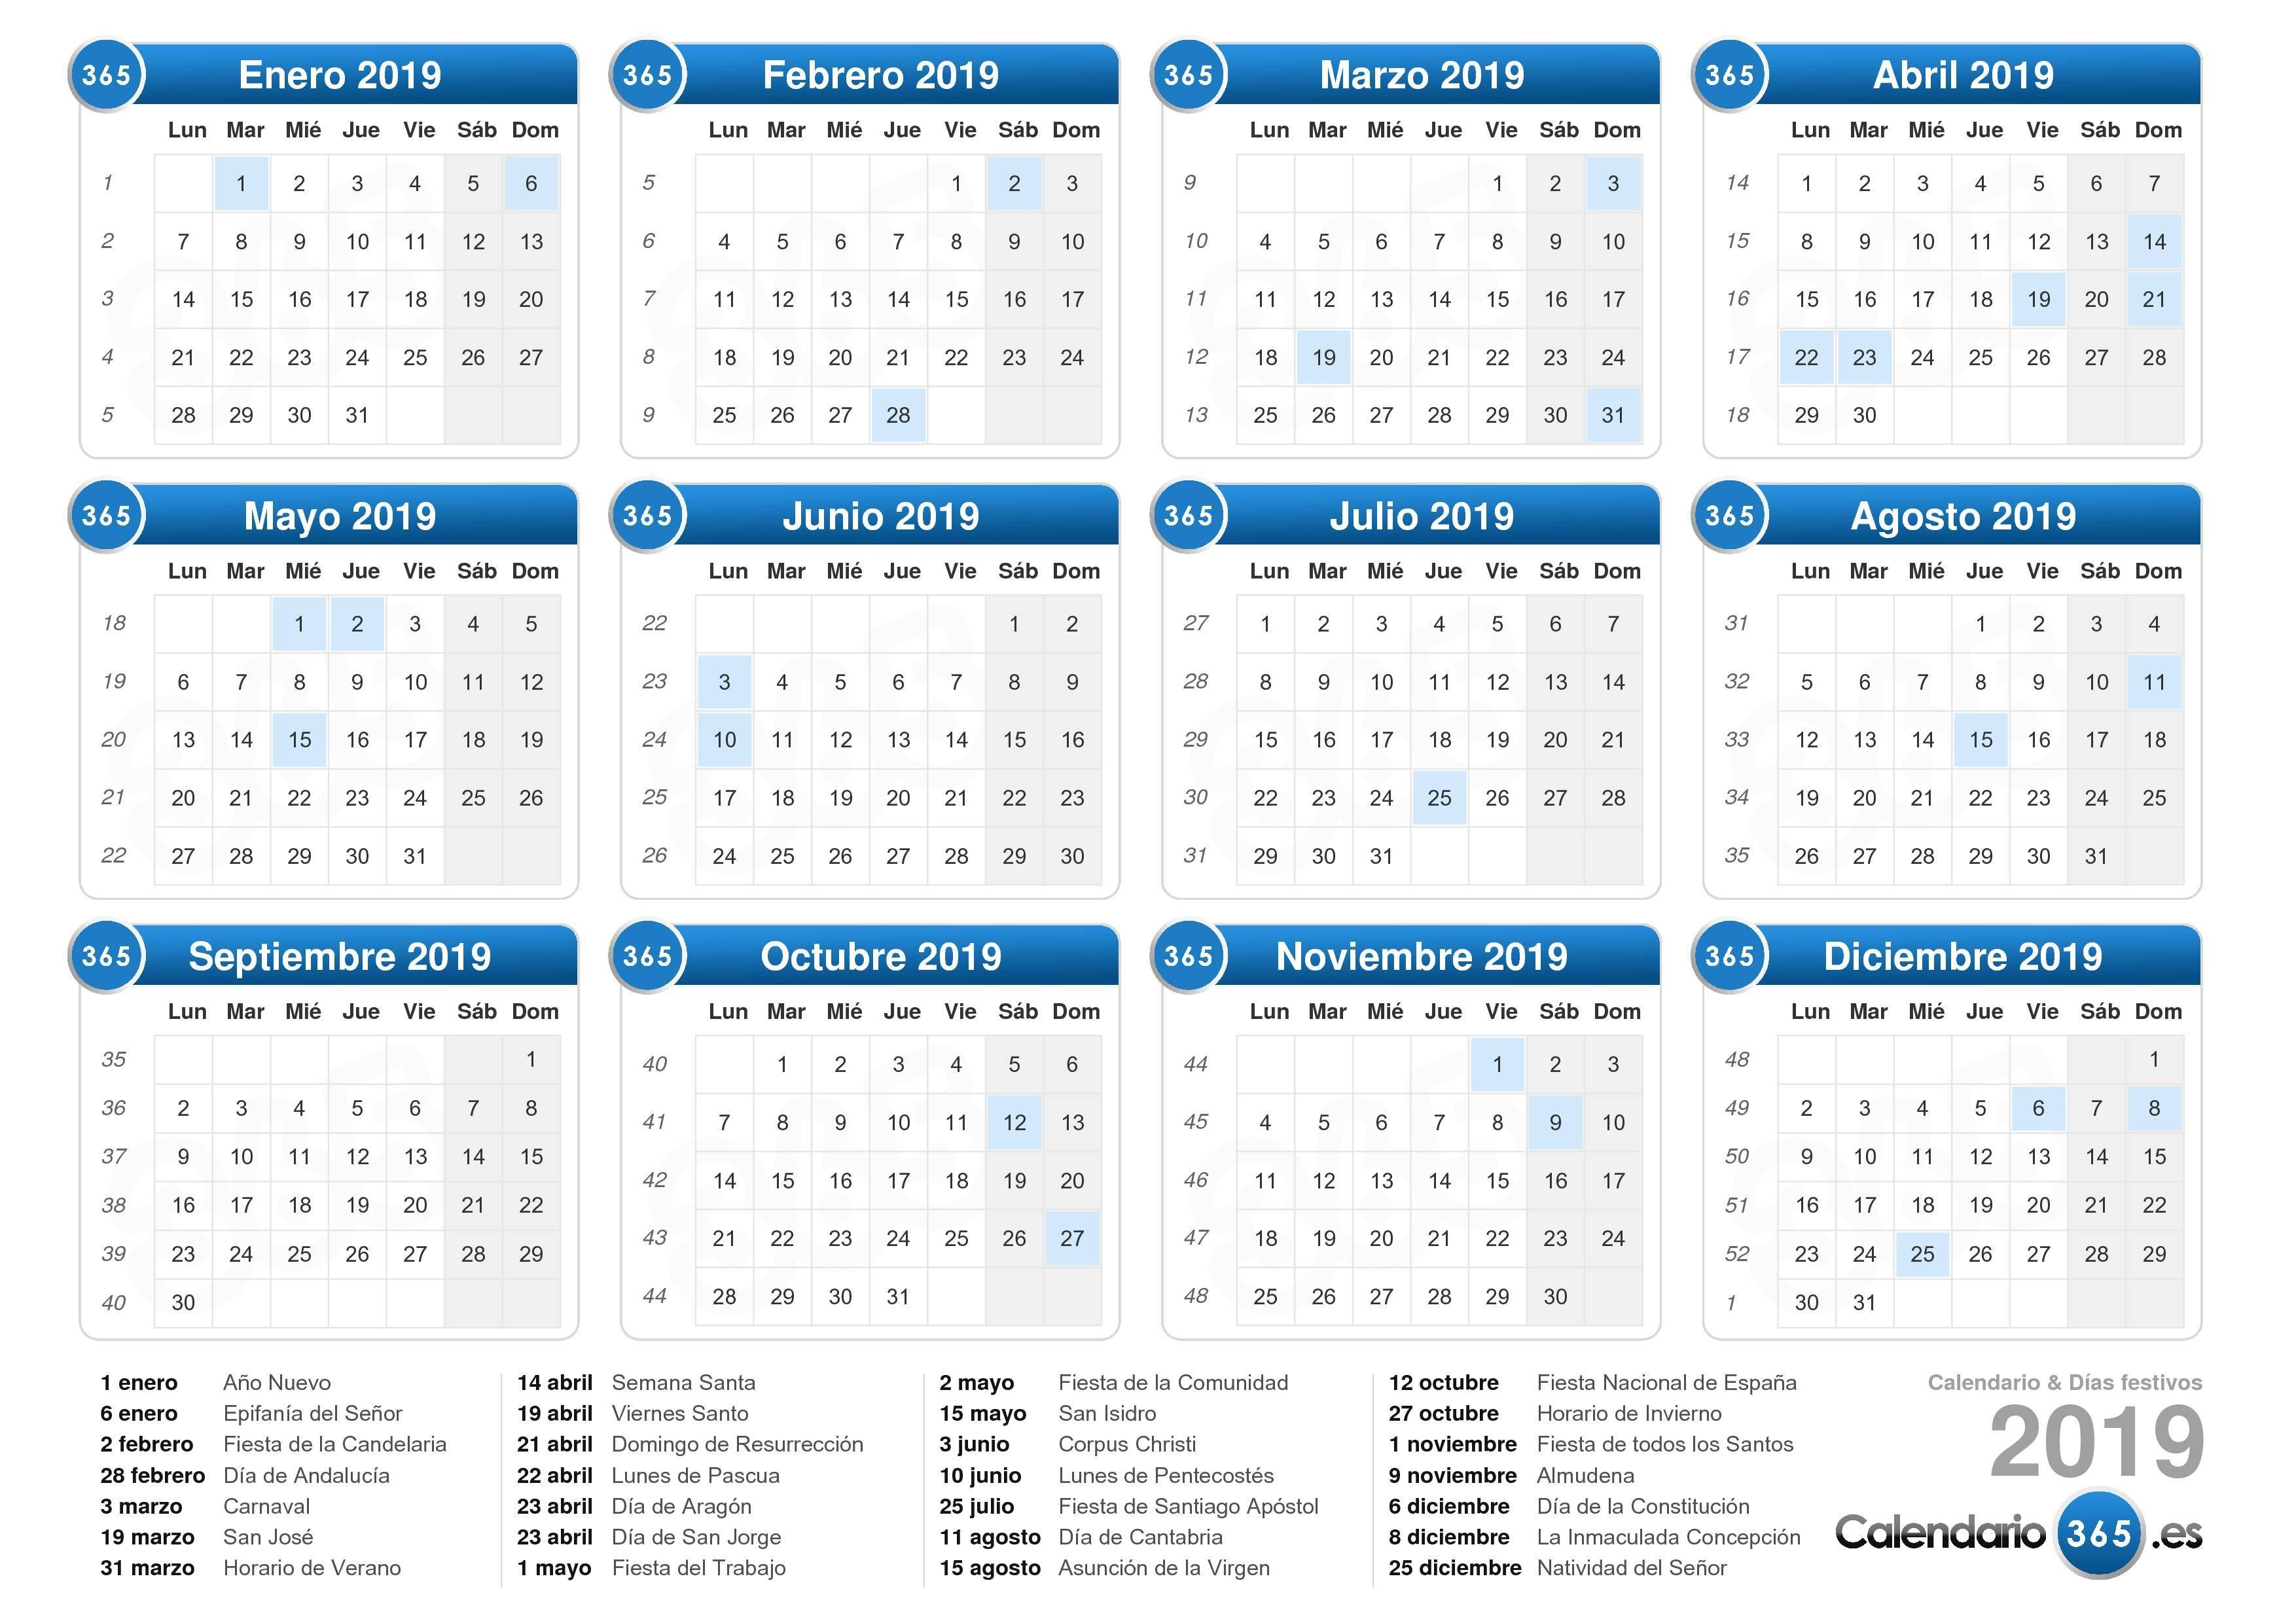 Calendario Perpetuo Semana Santa.Calendario 2019